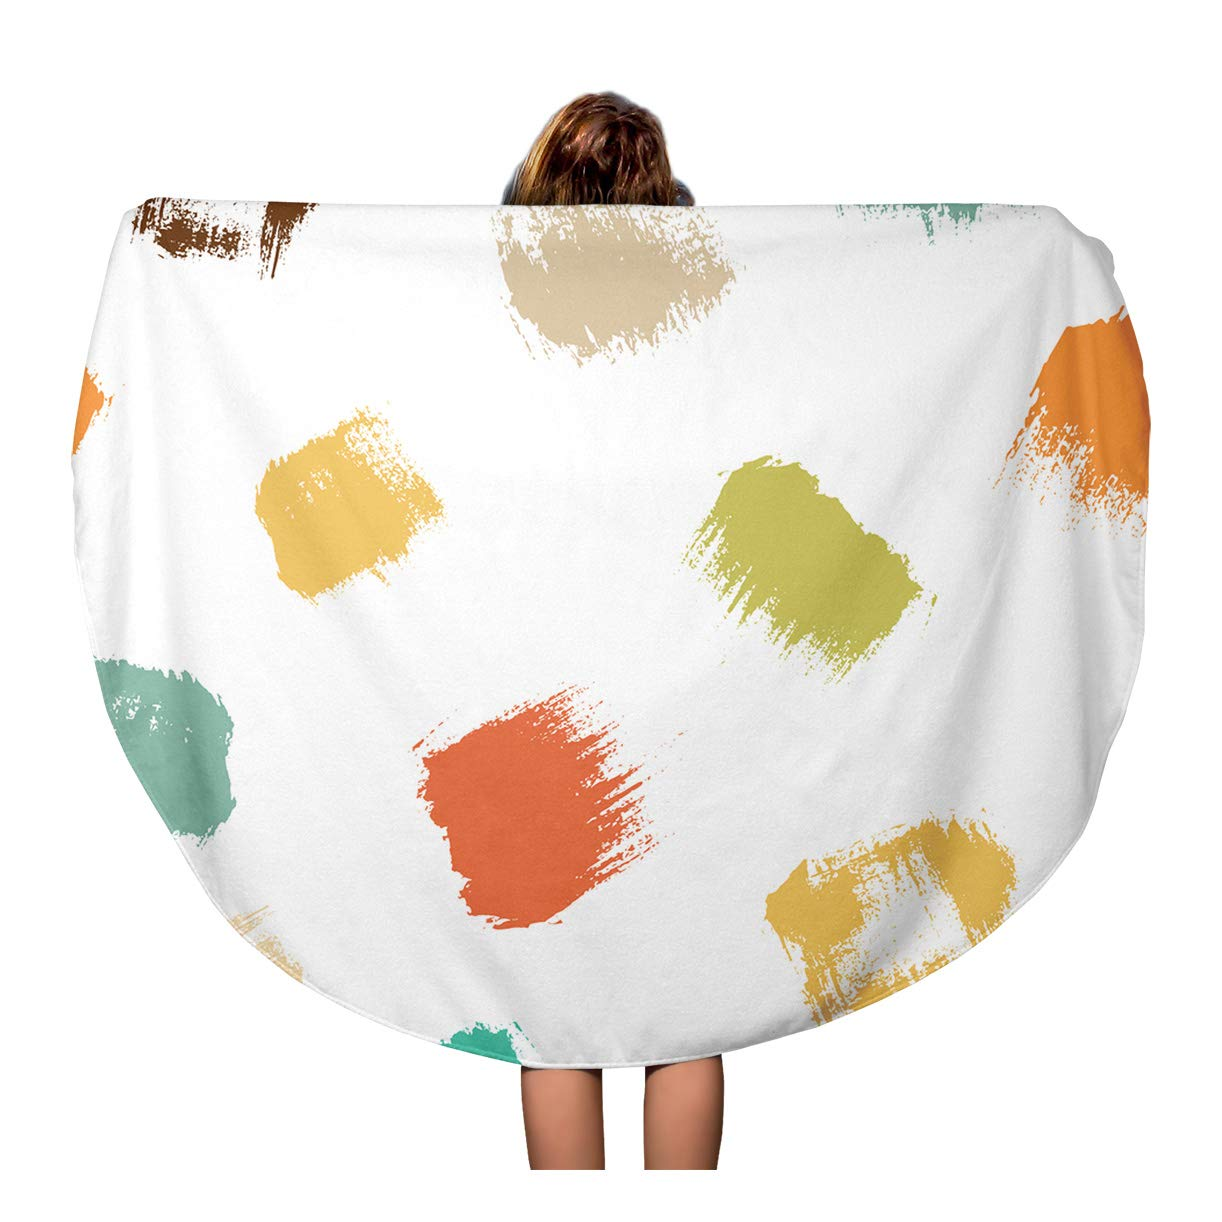 Kdagr 60 Inch Round Beach Towel Blanket Drawn Dry Brush